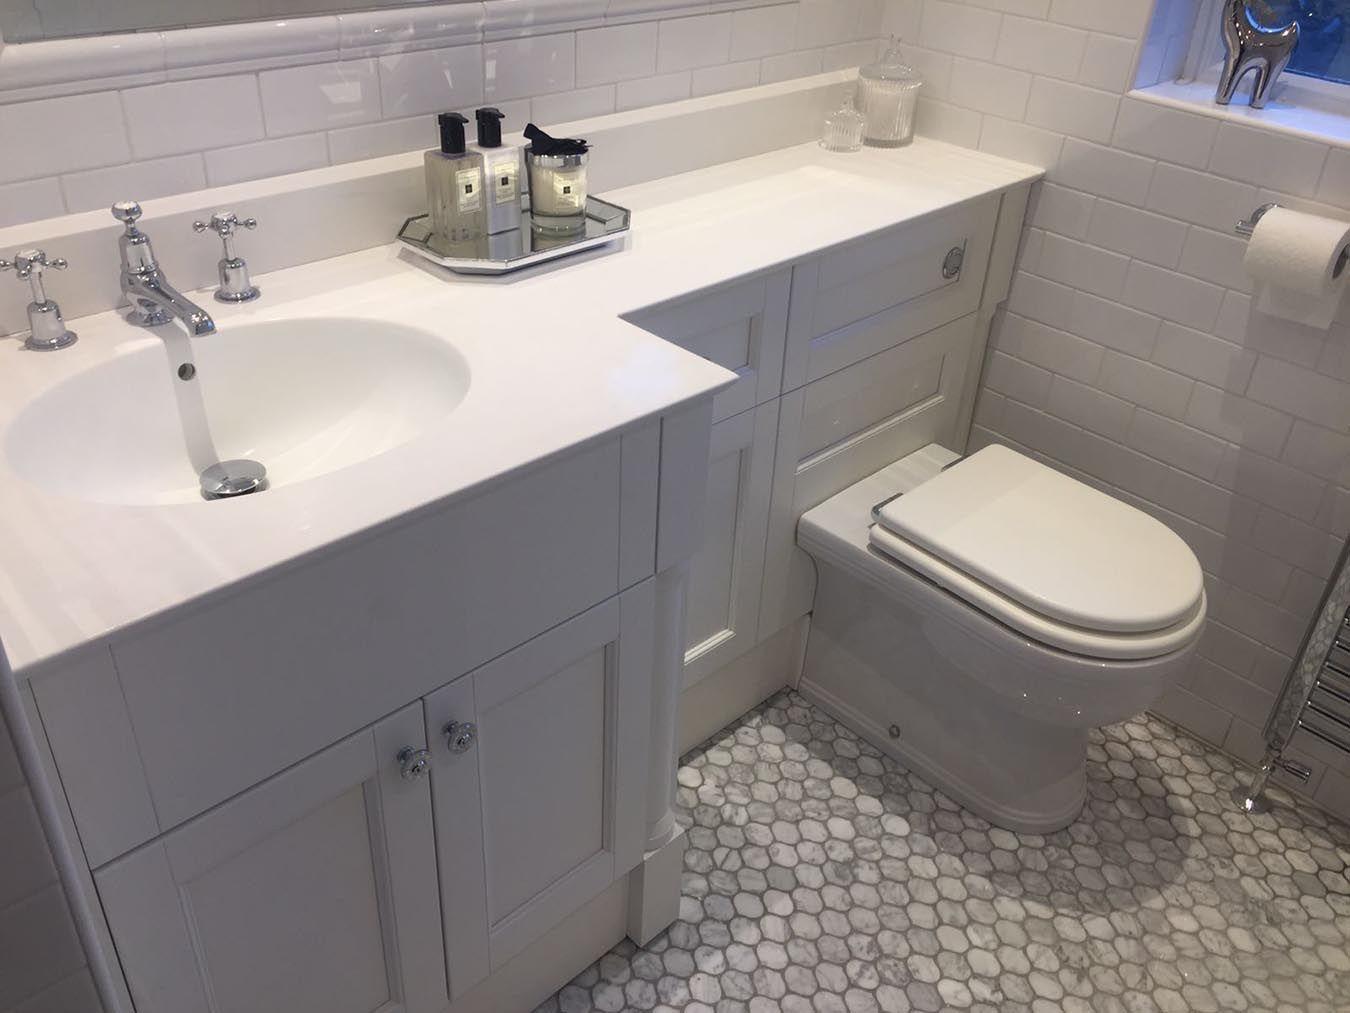 Utopia Rosebery Fitted Furniture  Fitted bathroom furniture